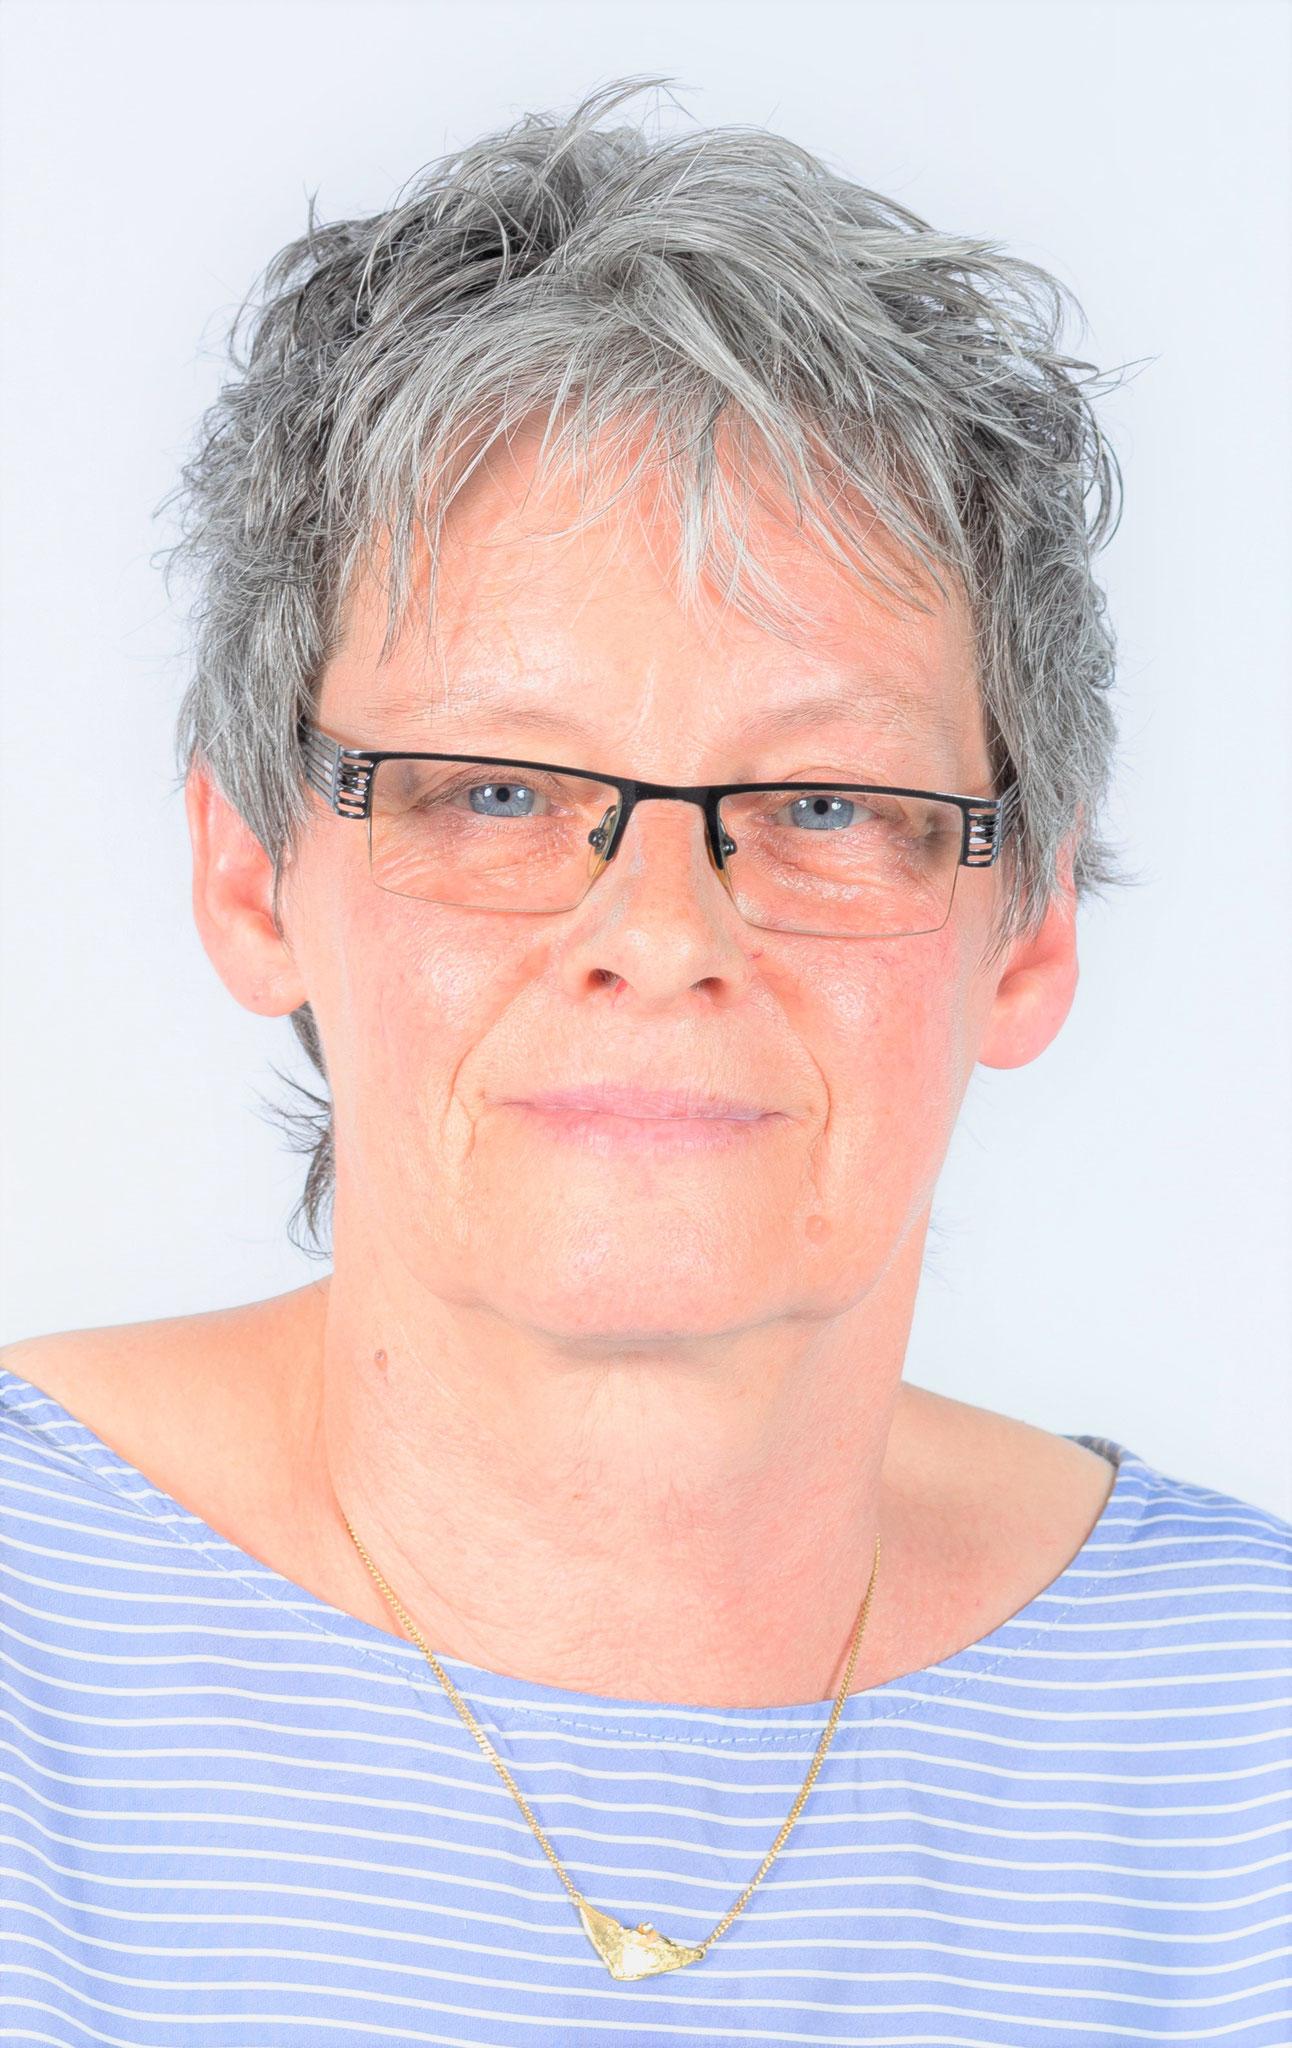 Doris Mülders, Umwelt- und Mobilitätsausschuss (stv.), Jugend-, Sozial- und Seniorenausschuss (stv.)